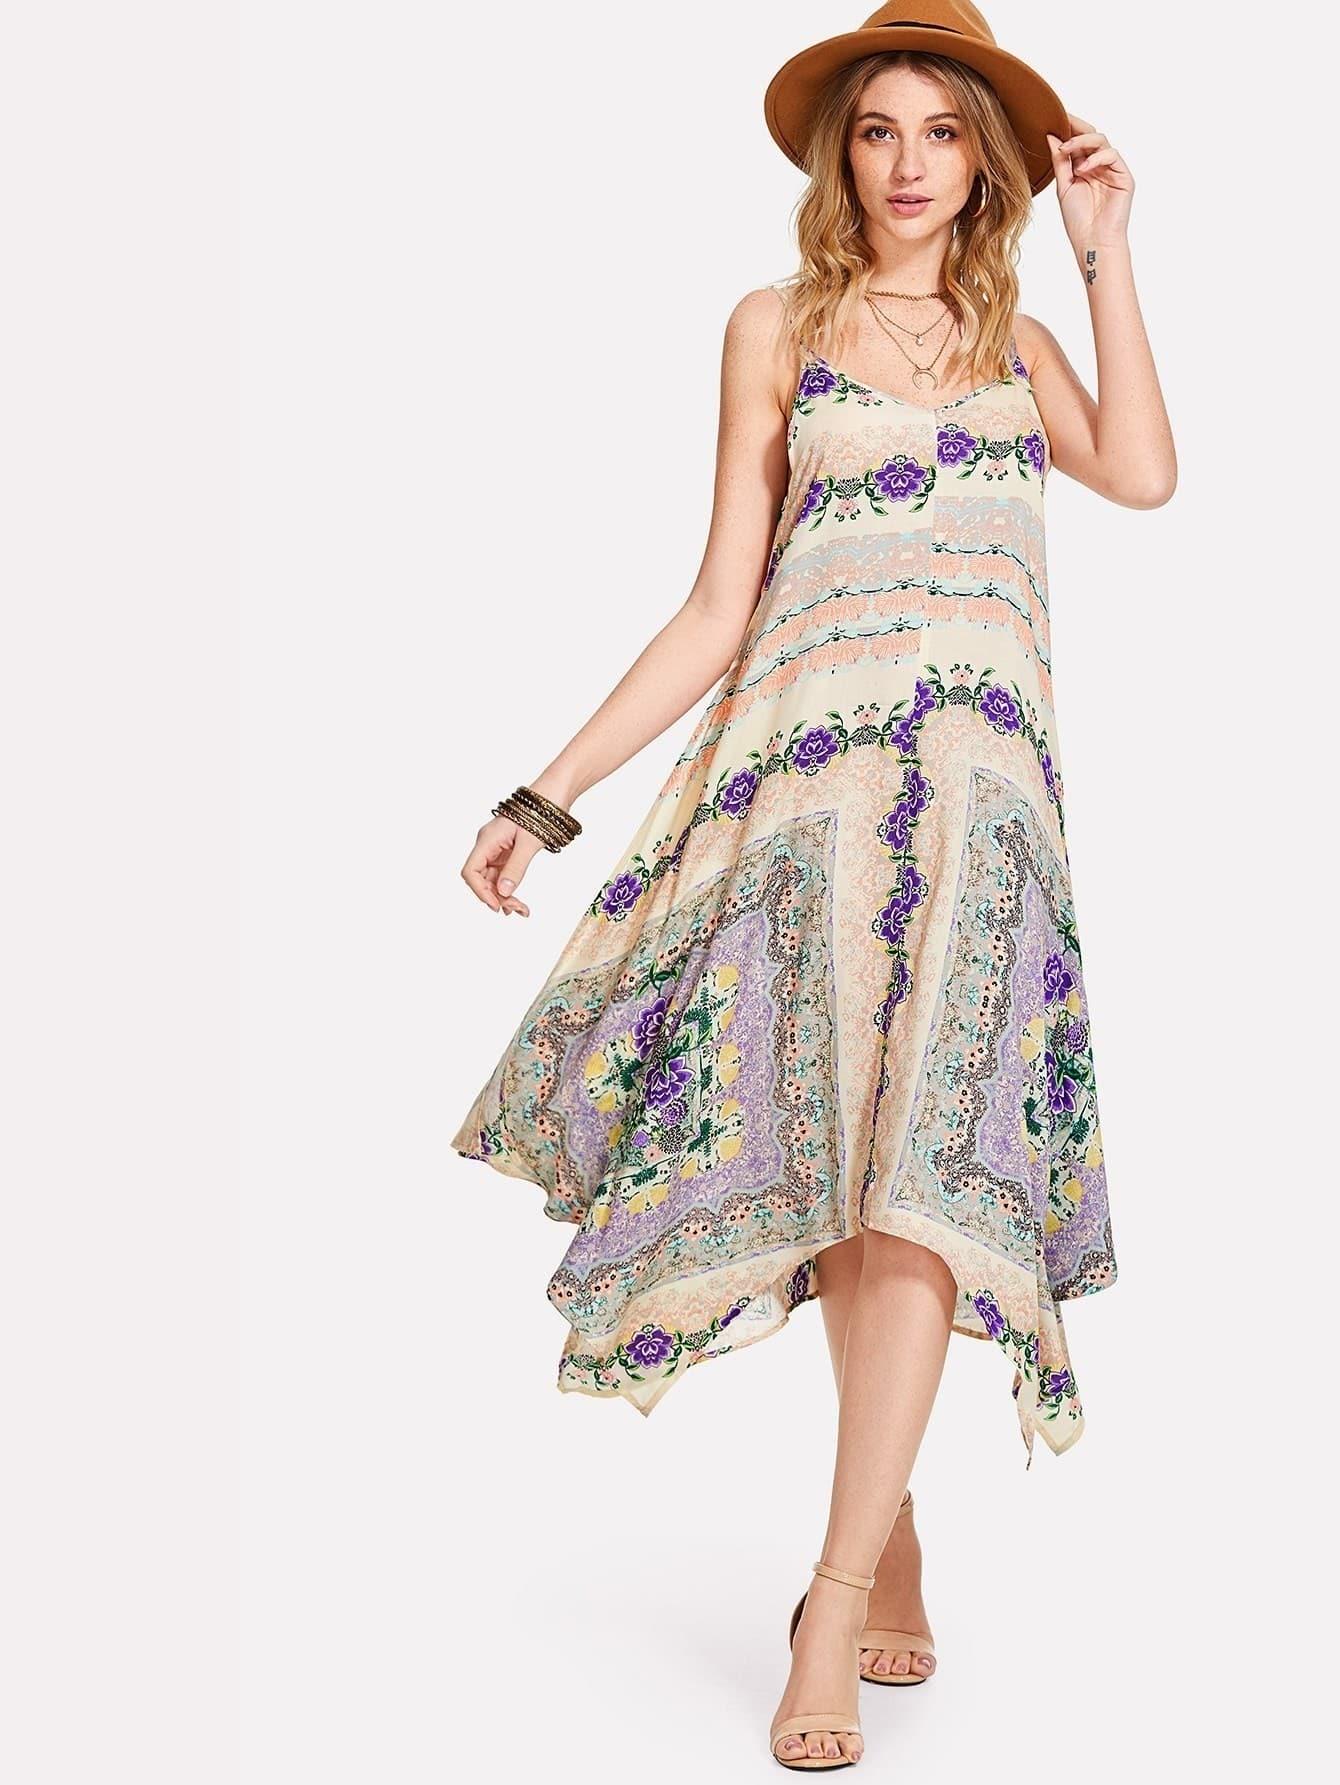 Flower Print Hanky Hem Swing Cami Dress high slit hanky hem metallic halter dress